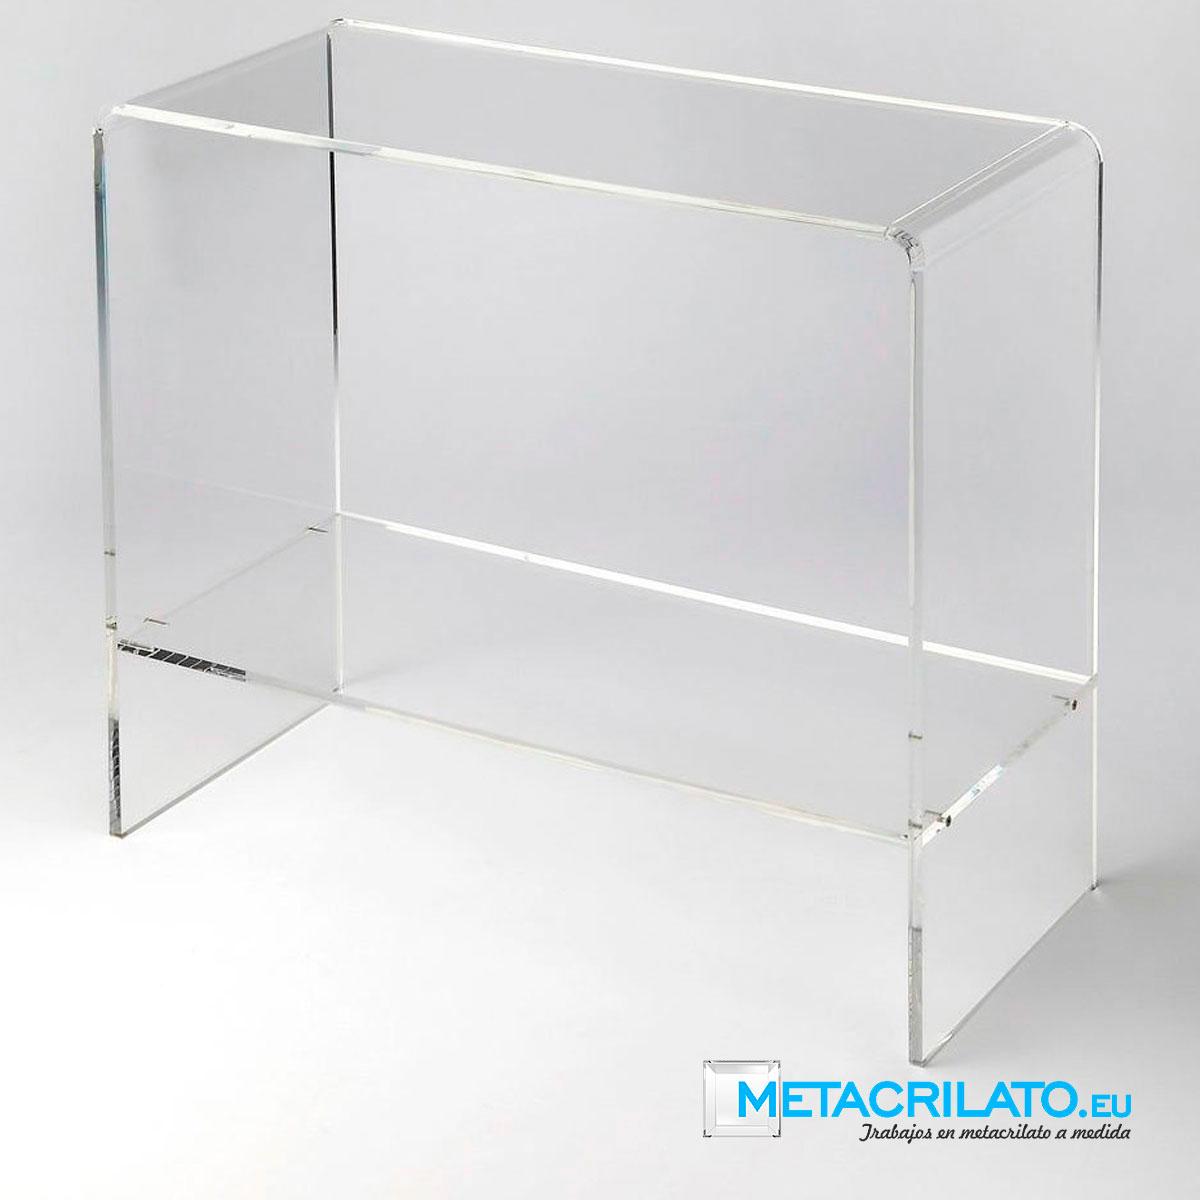 Mobiliario de metacrilato